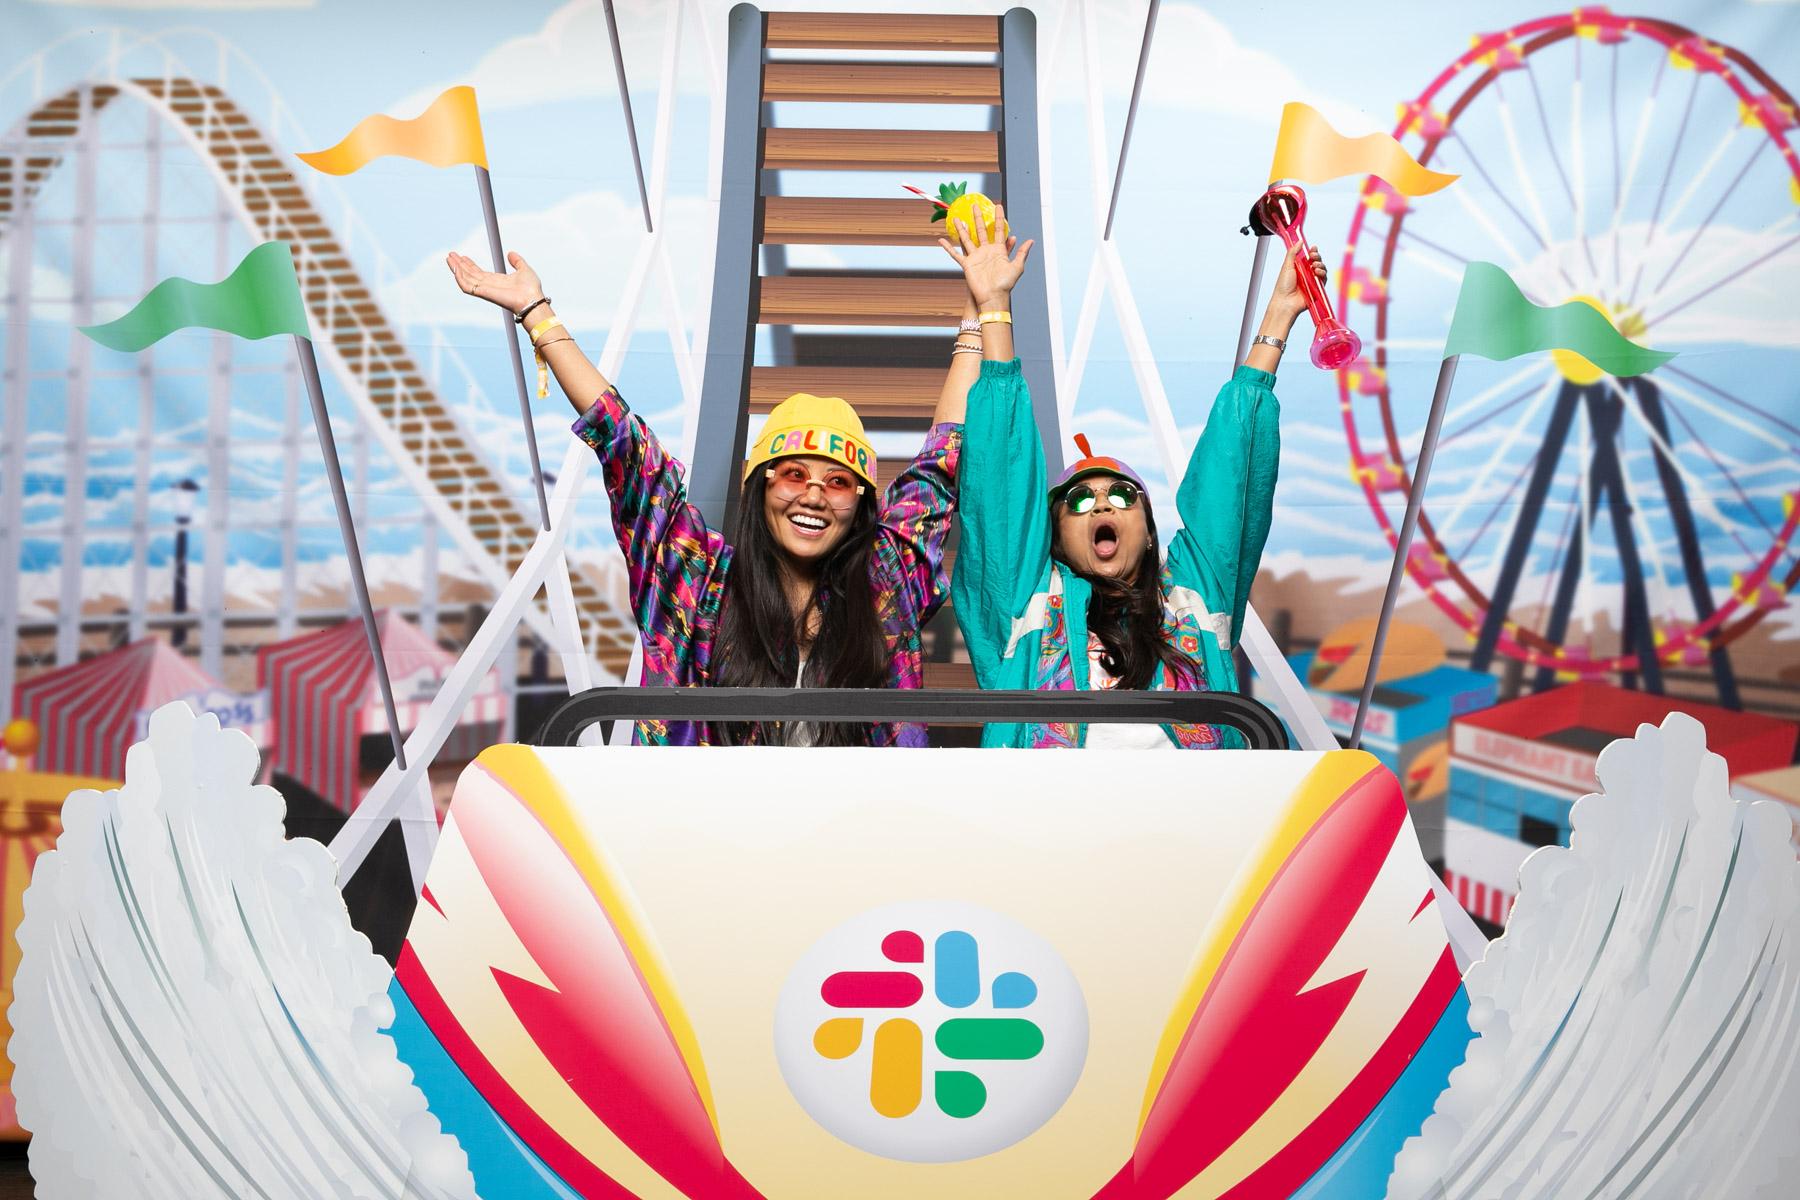 Roller Coaster - Boardwalk roller coaster set for Slack's Santa Cruz boardwalk inspired summer picnic.